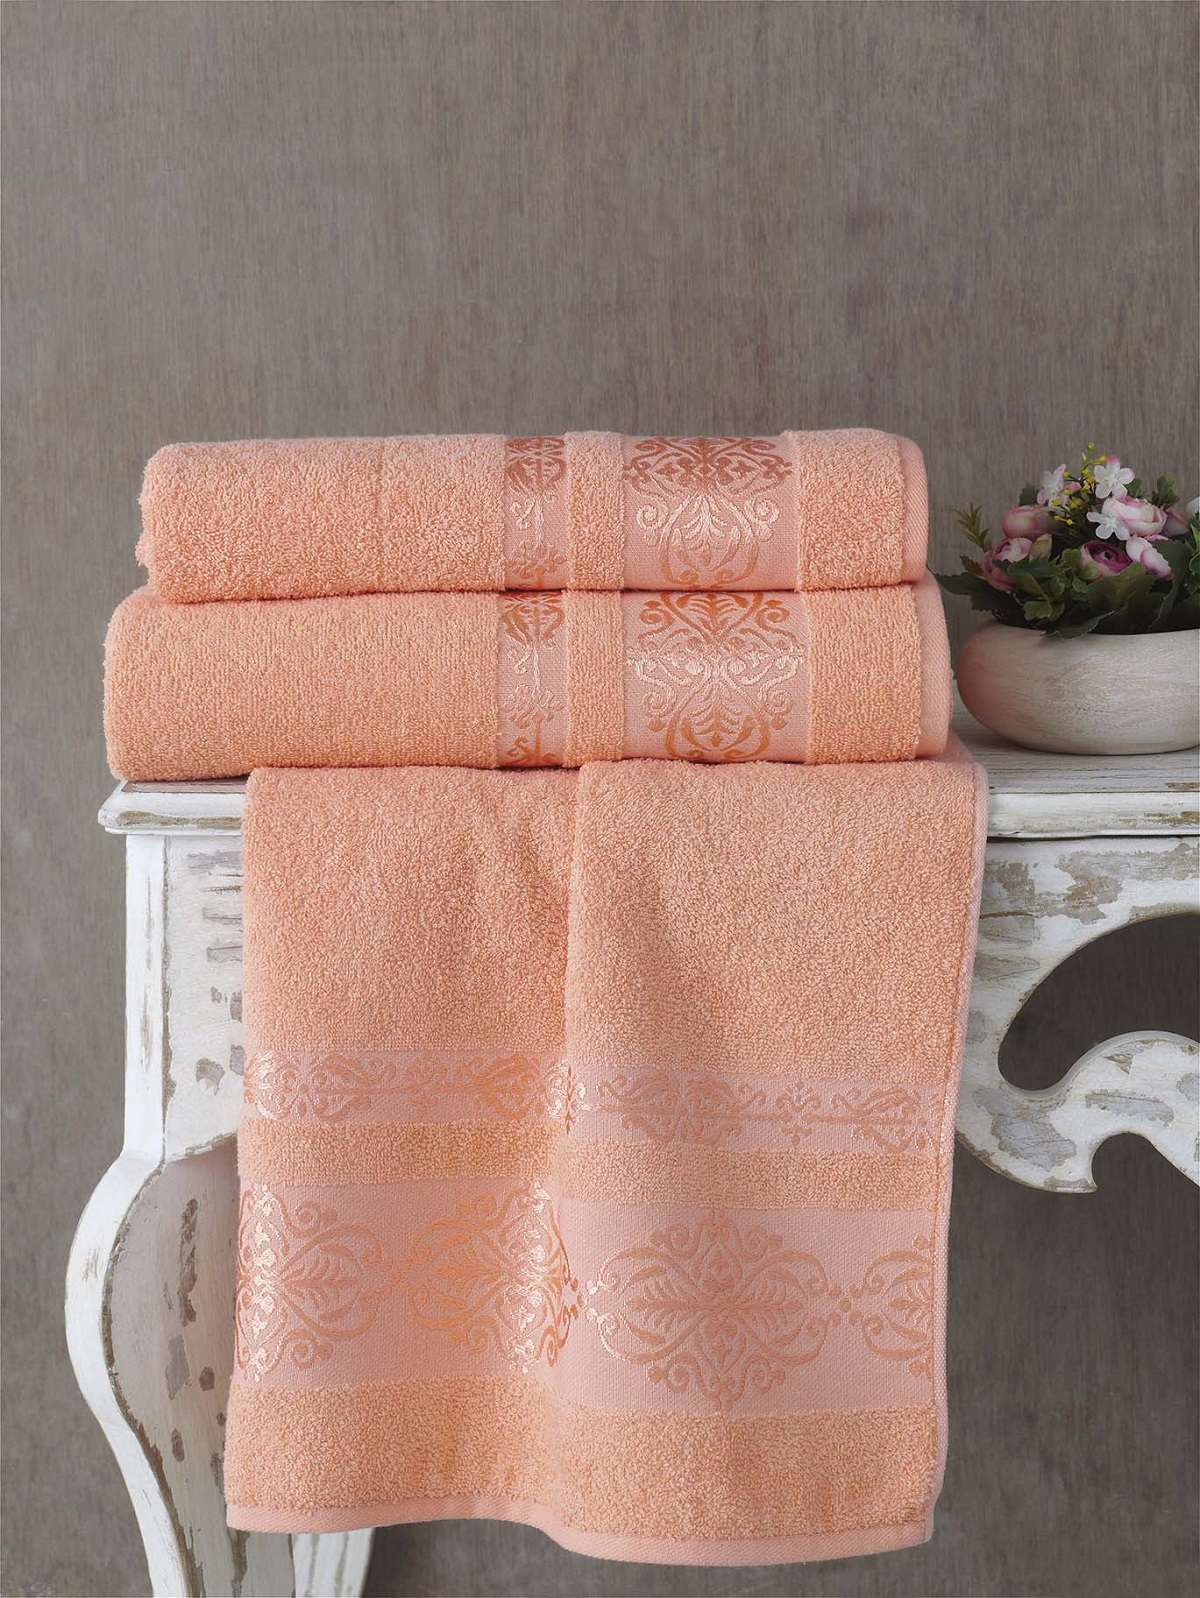 Полотенца Karna Полотенце Rebeka Цвет: Абрикосовый (70х140 см) полотенца karna полотенце iteka цвет коричневый 70х140 см